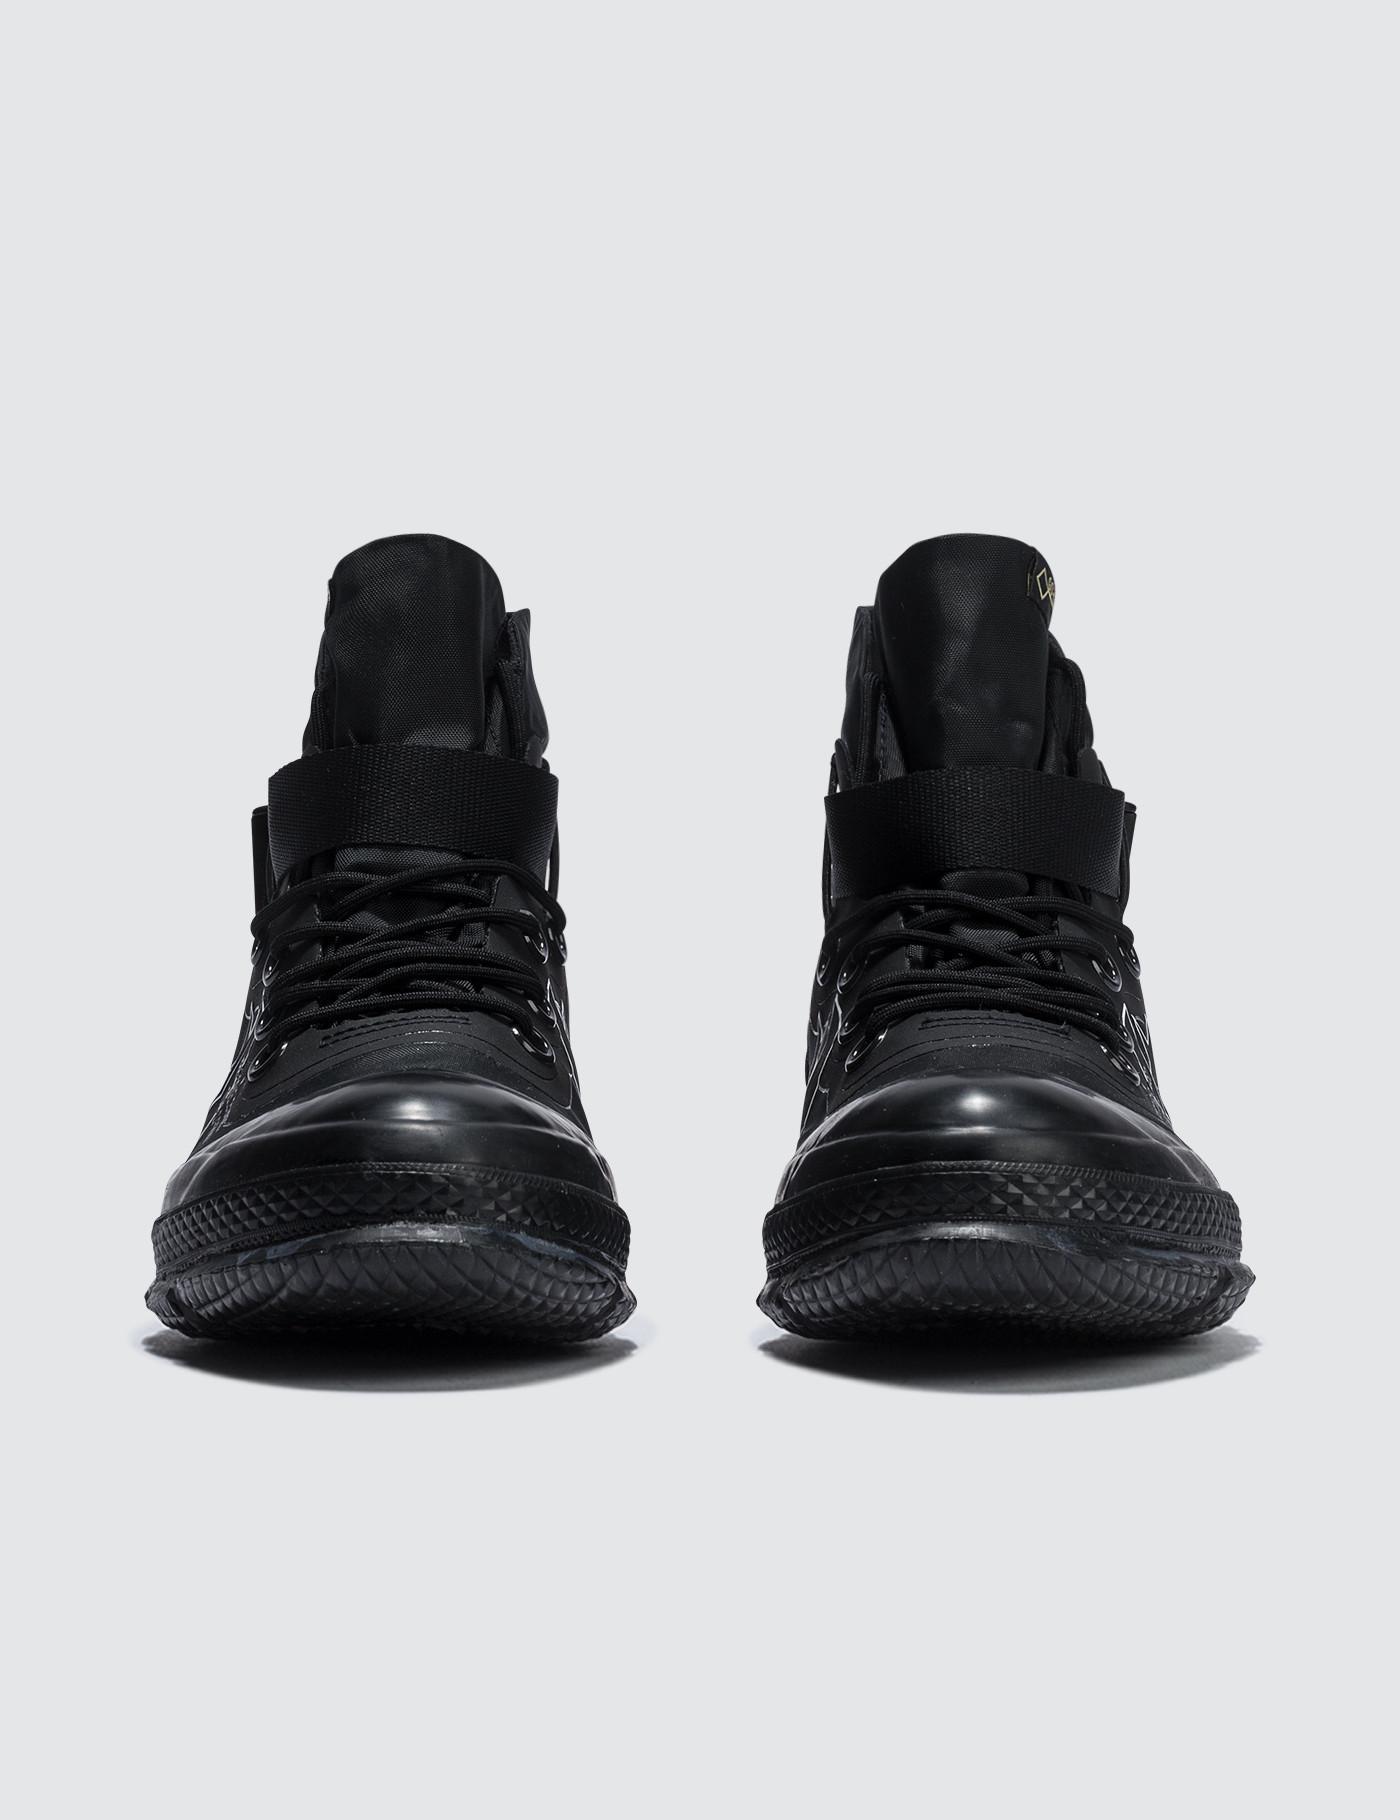 Lyst - Converse Fastbreak Mc18 Hi in Black for Men b1353eac3